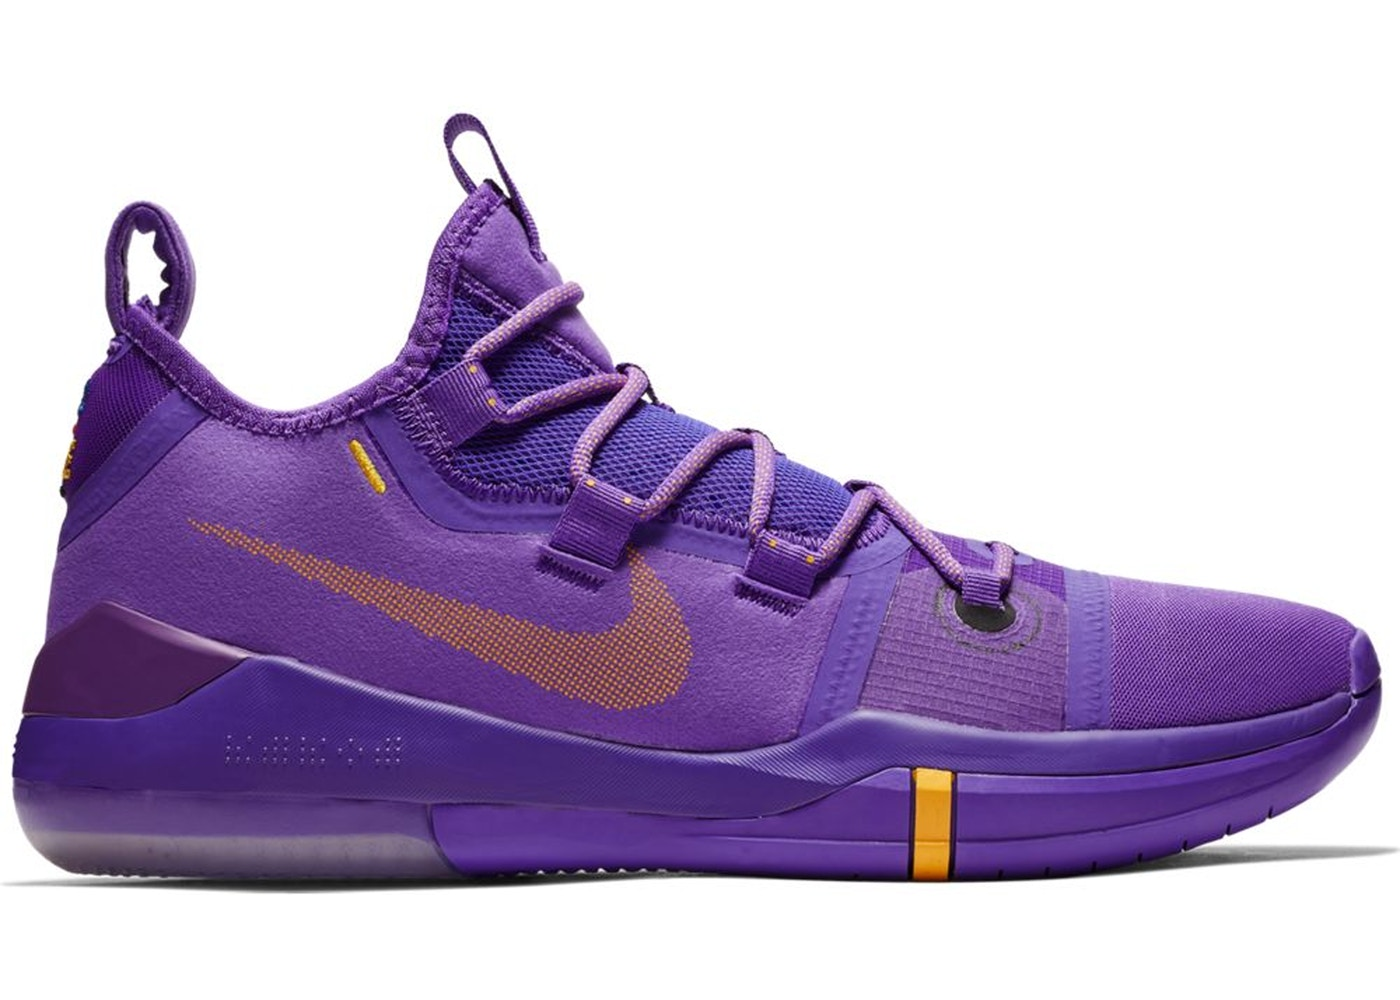 new style 4d6eb e6dea Kobe AD Lakers Hyper Grape - AR5515-500